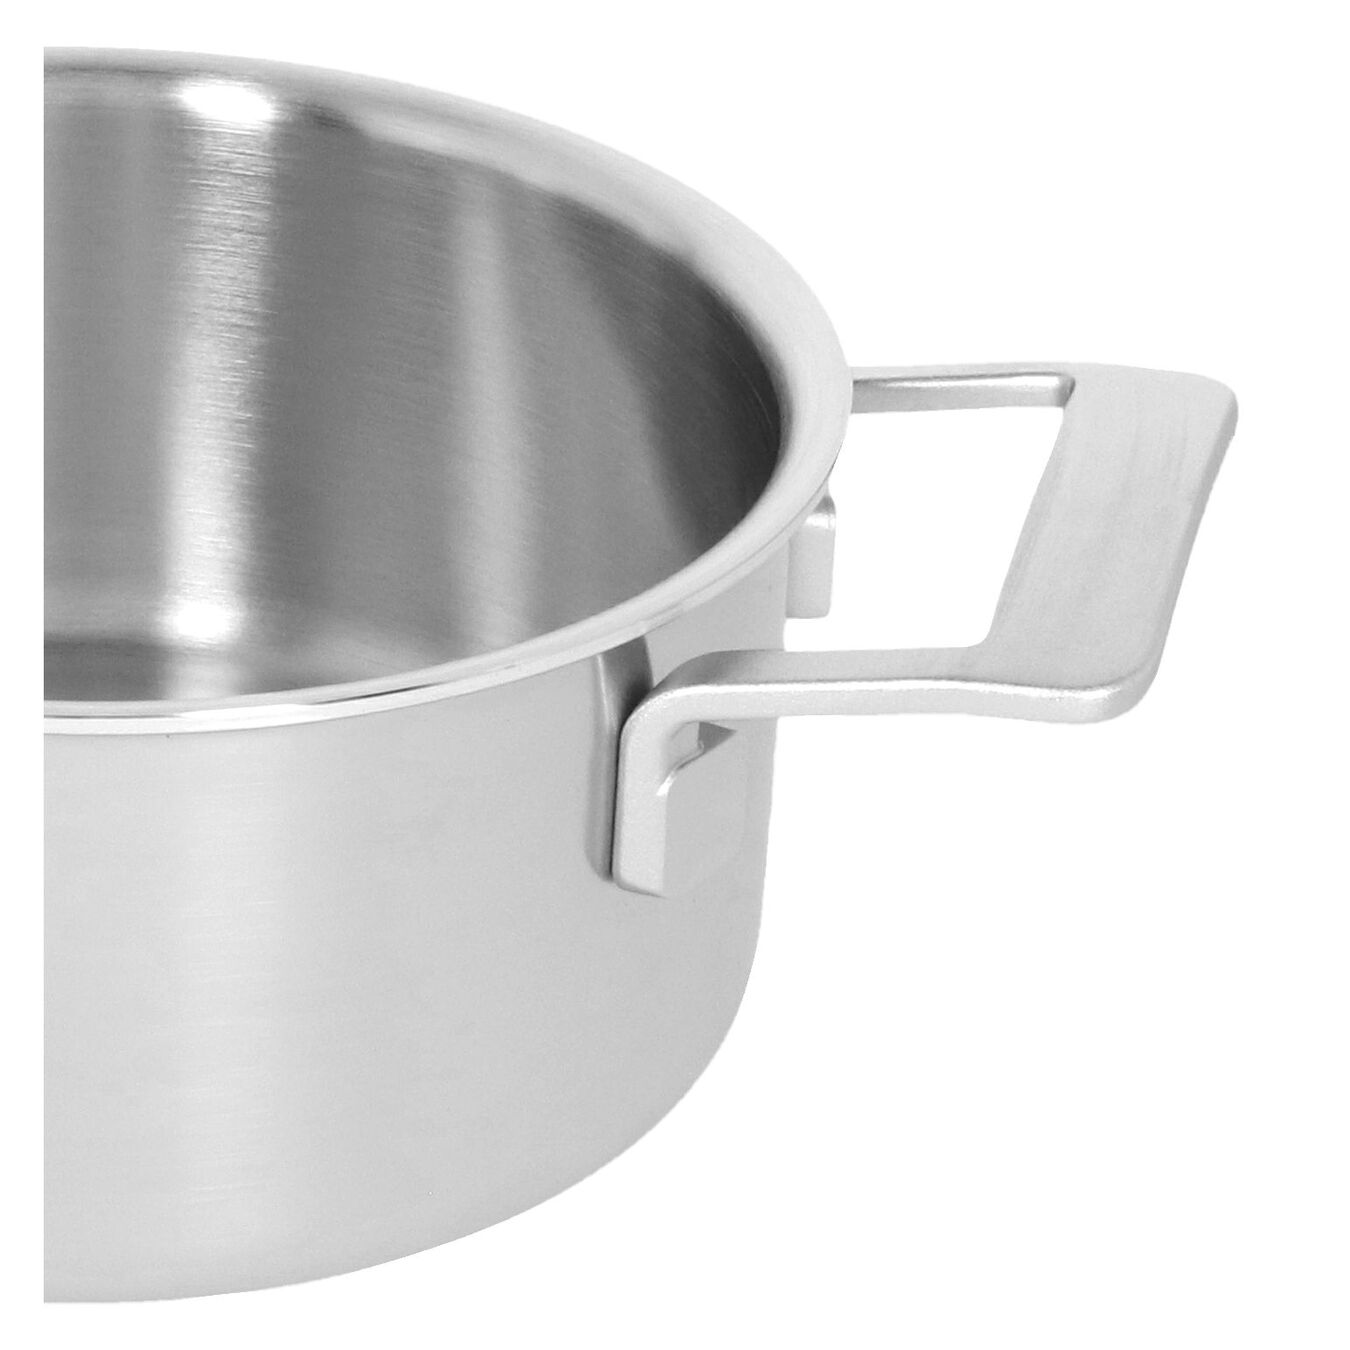 Kookpot met deksel 18 cm / 2,25 l,,large 6